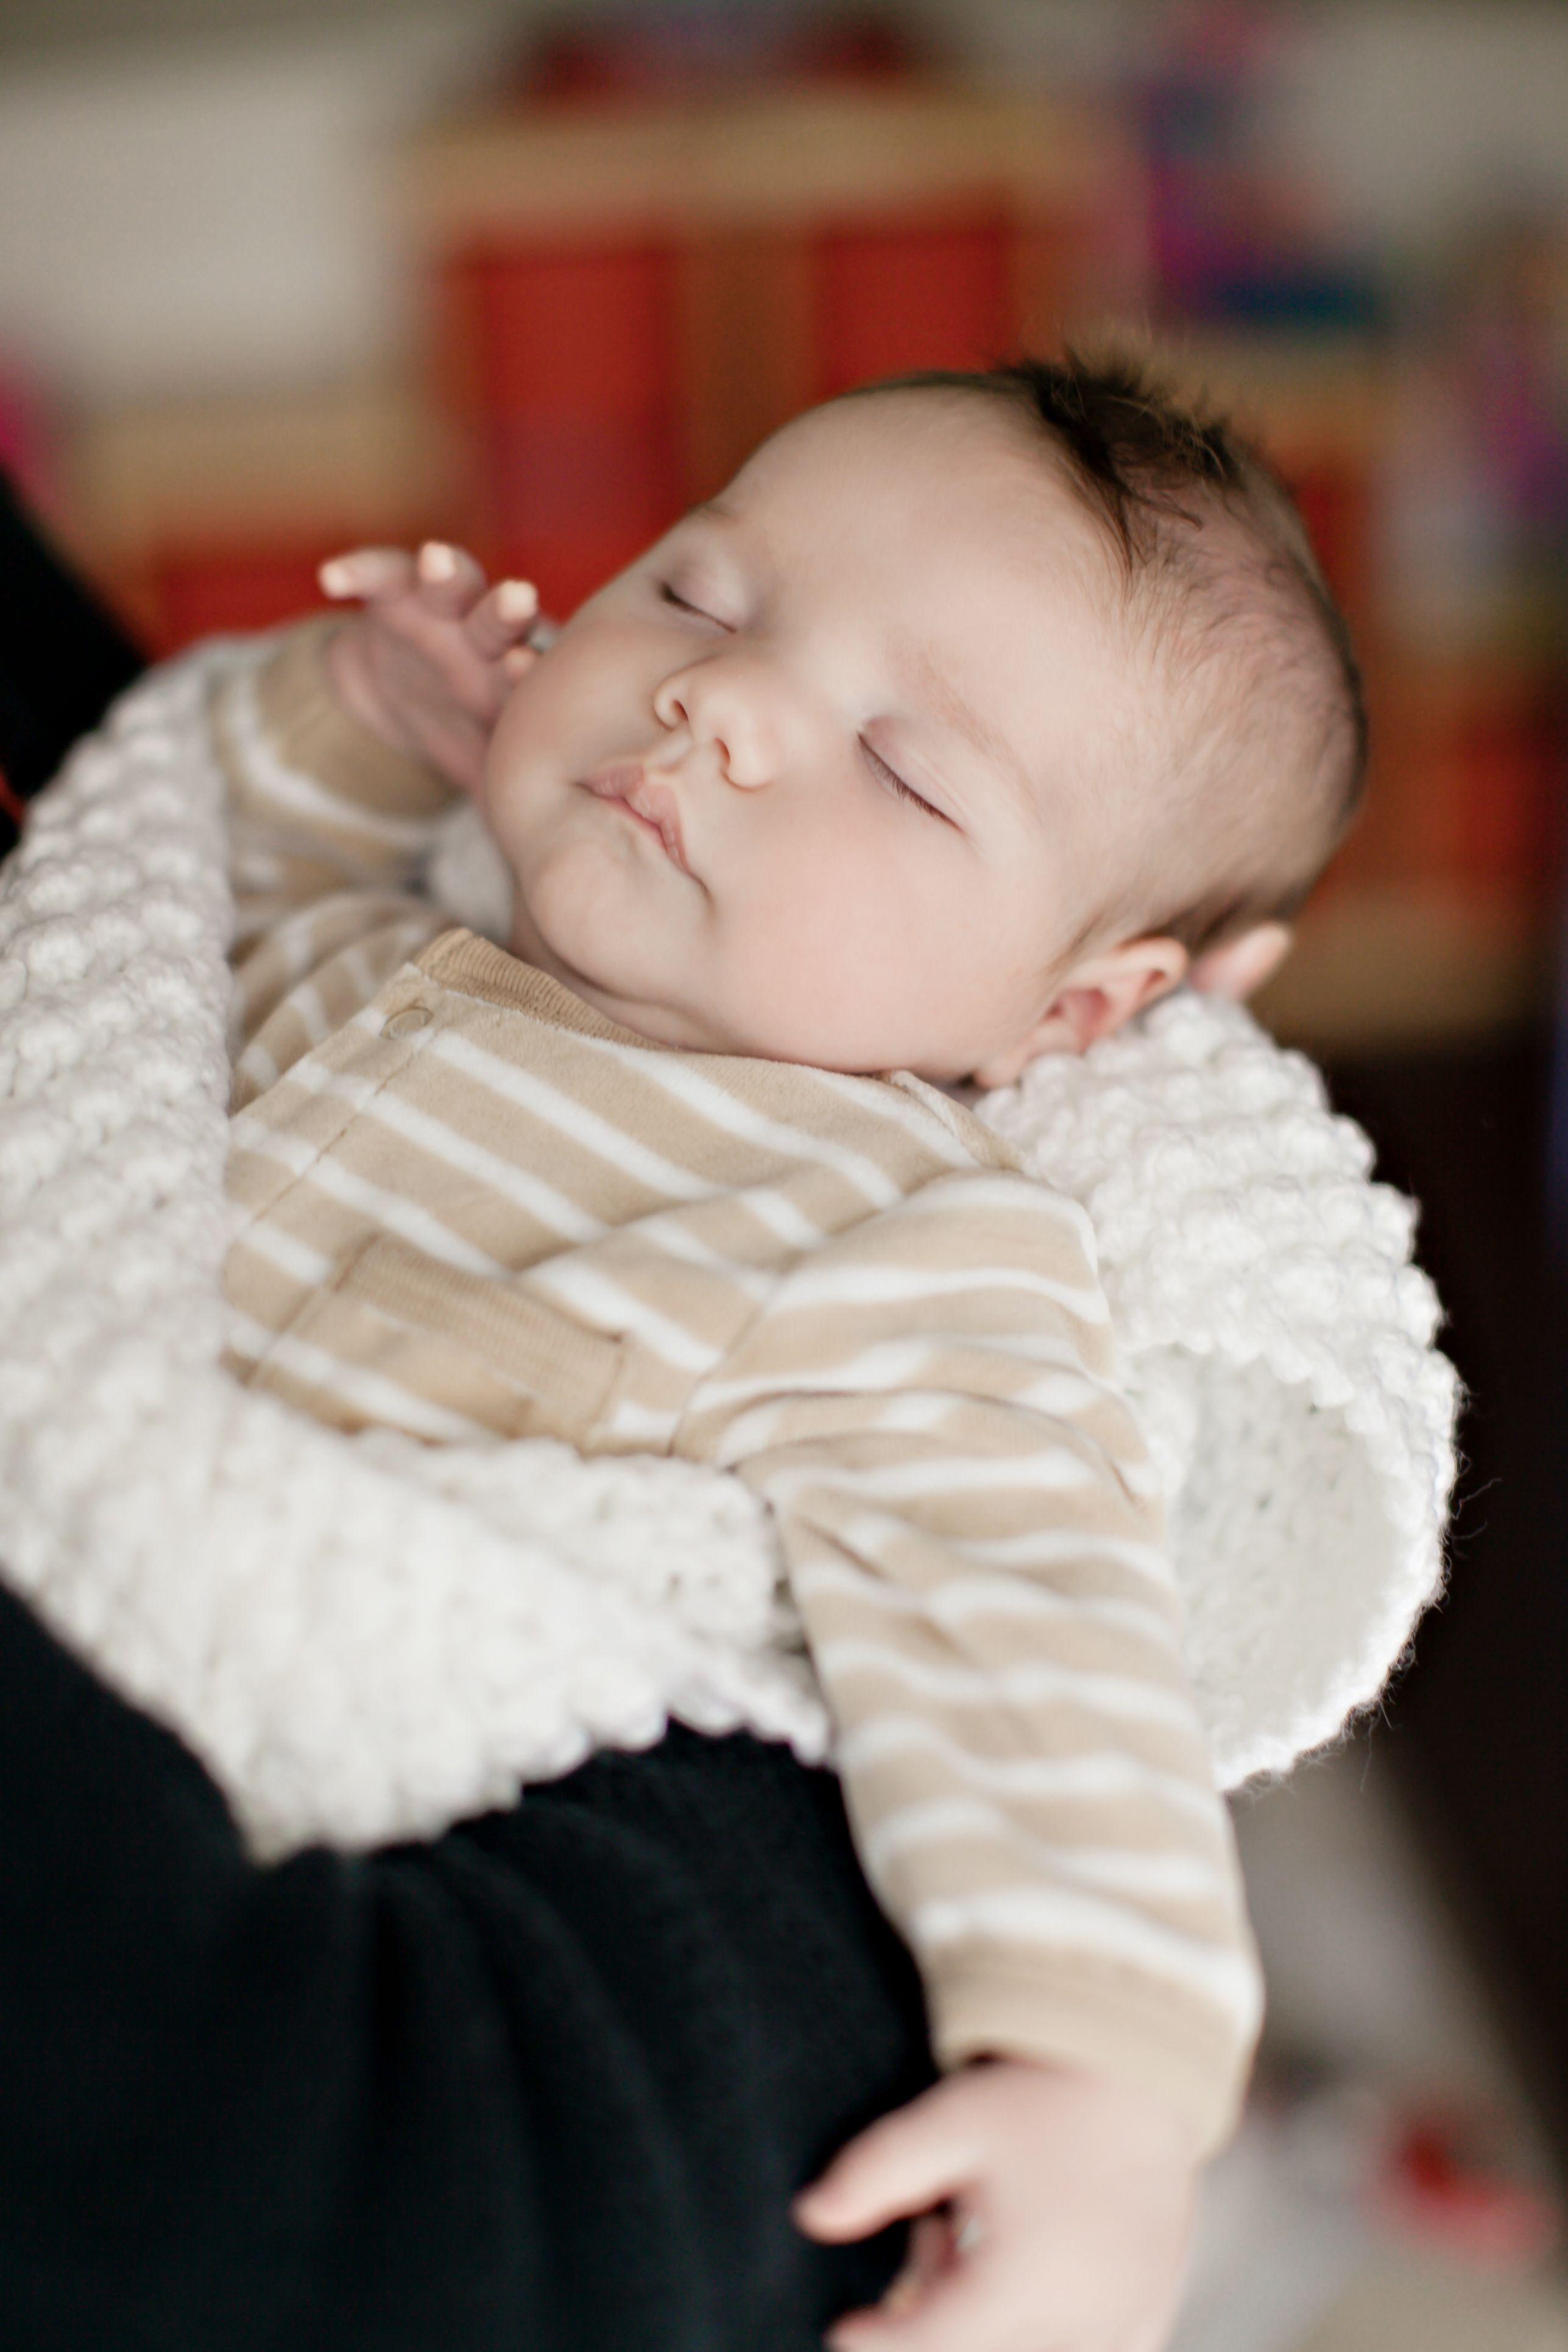 Here's my little sweetie :)